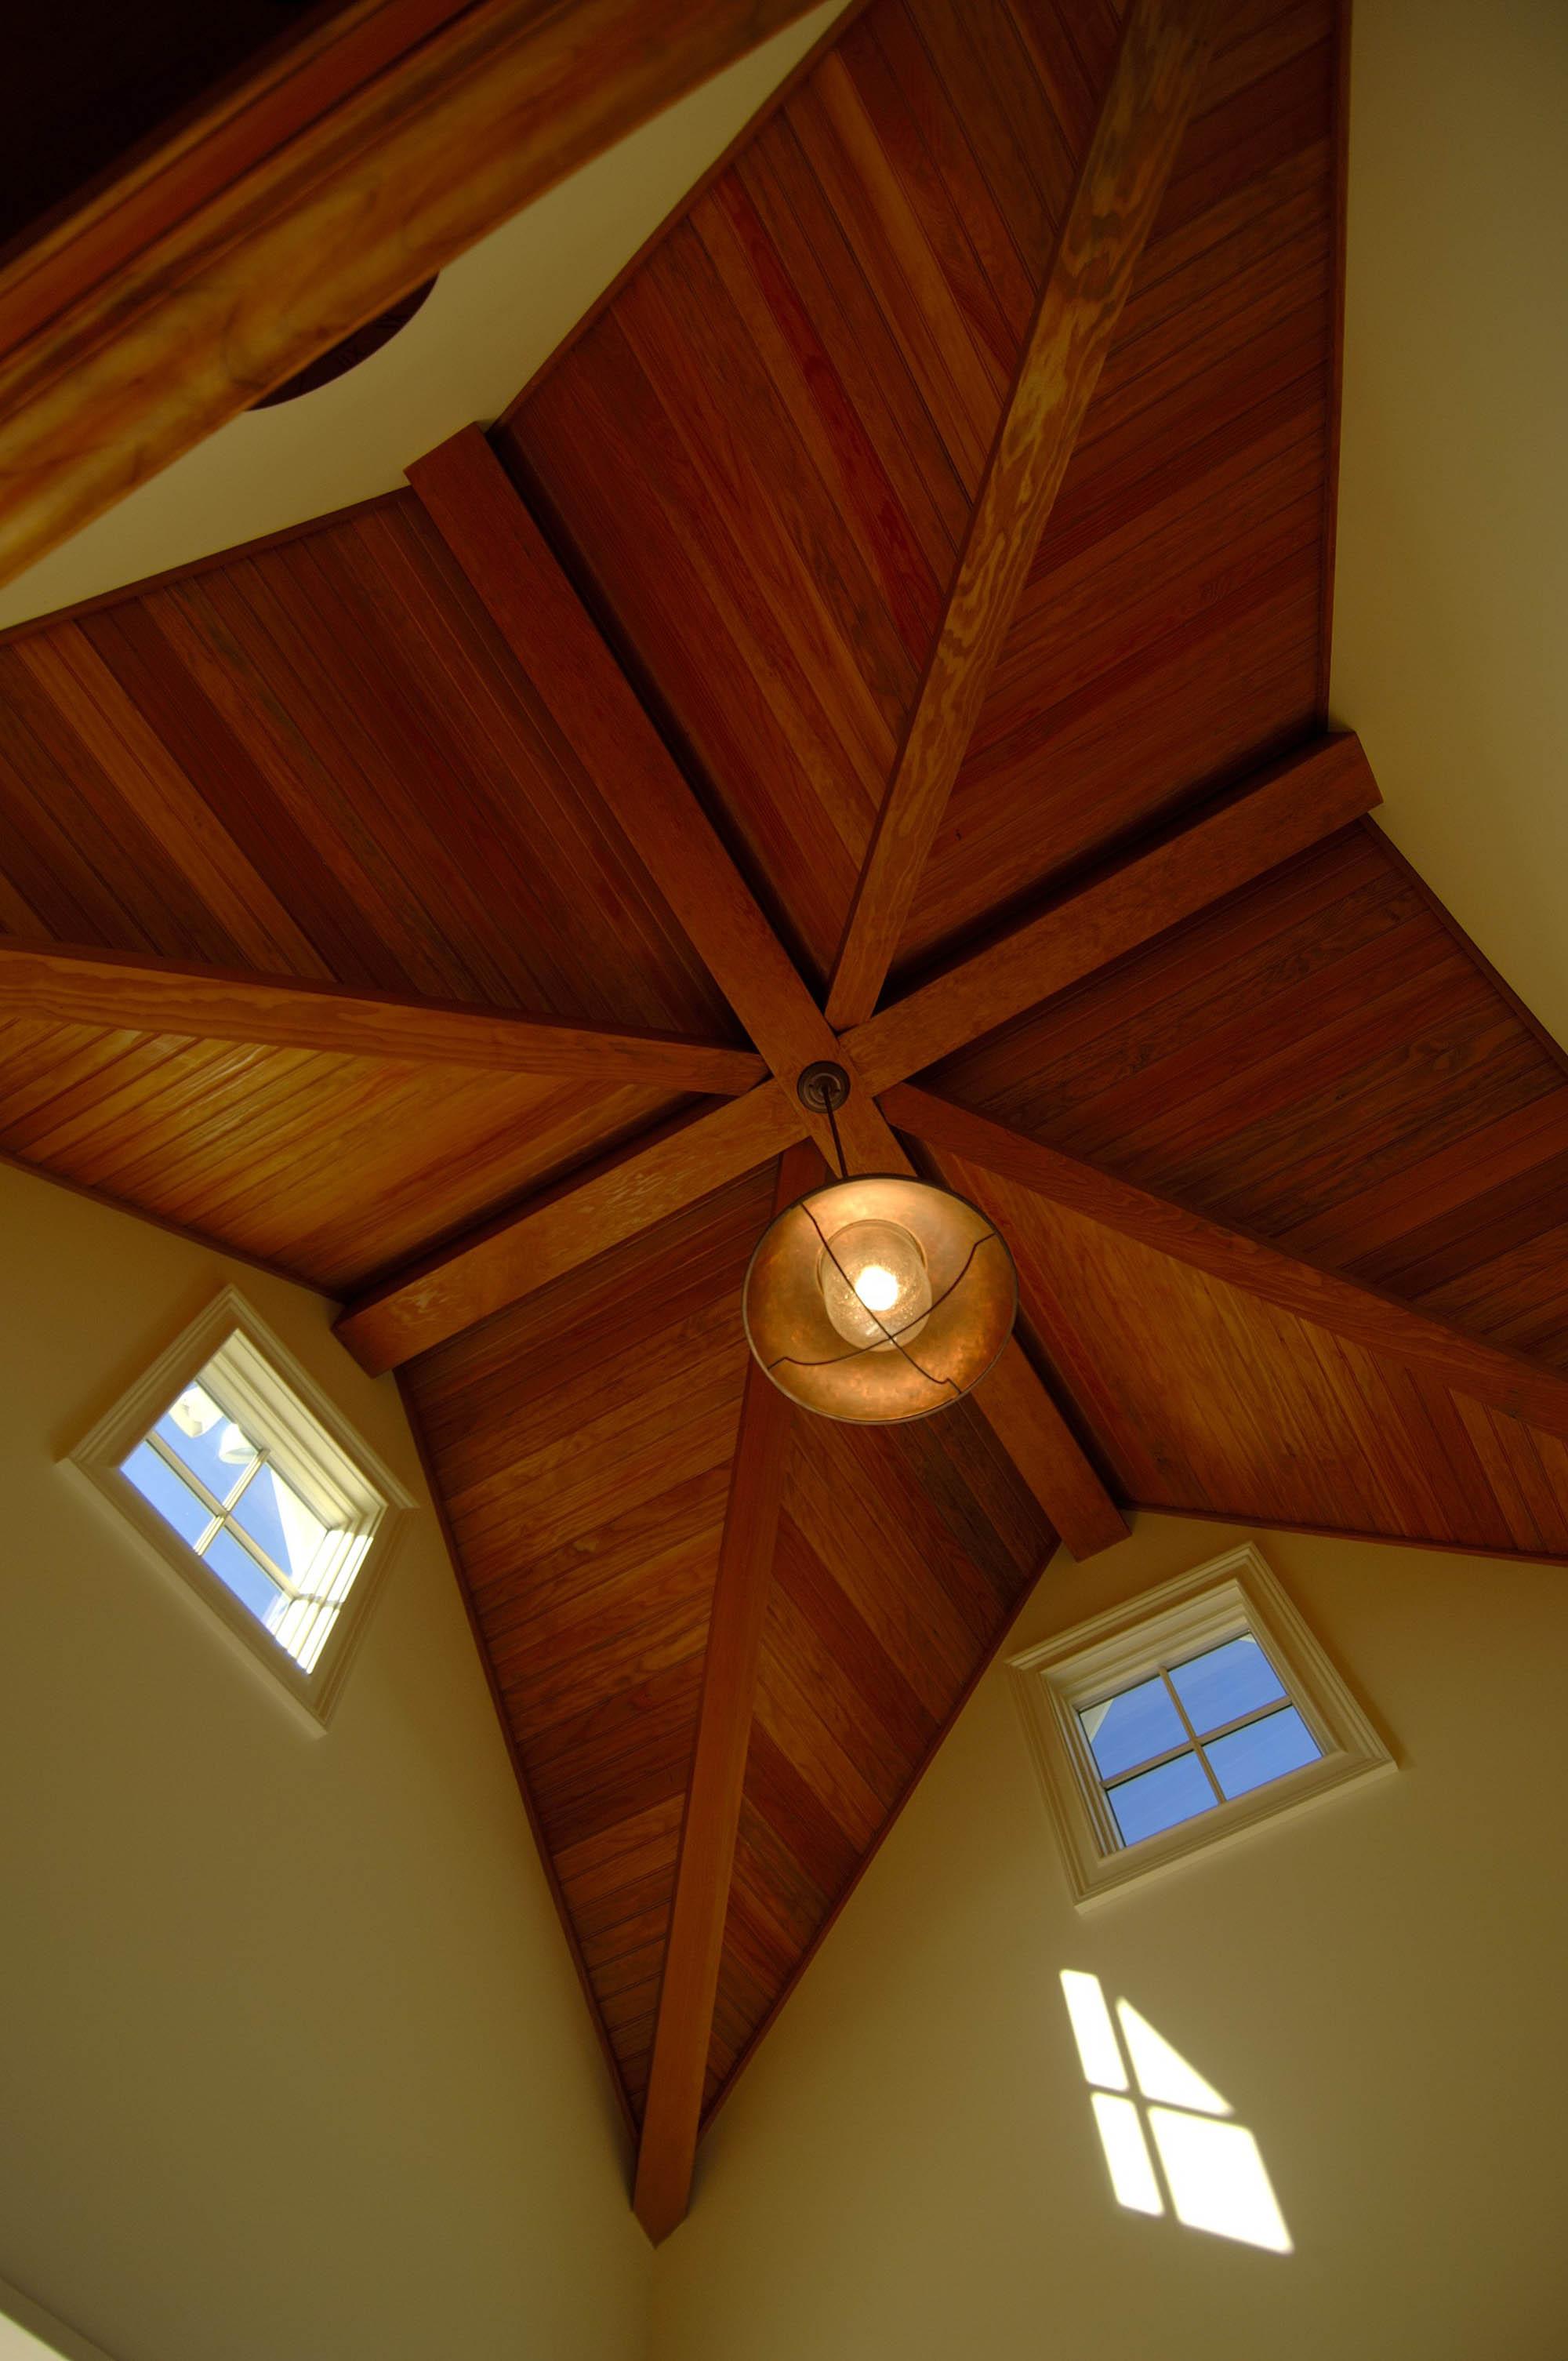 HSA Star Ceiling.jpg